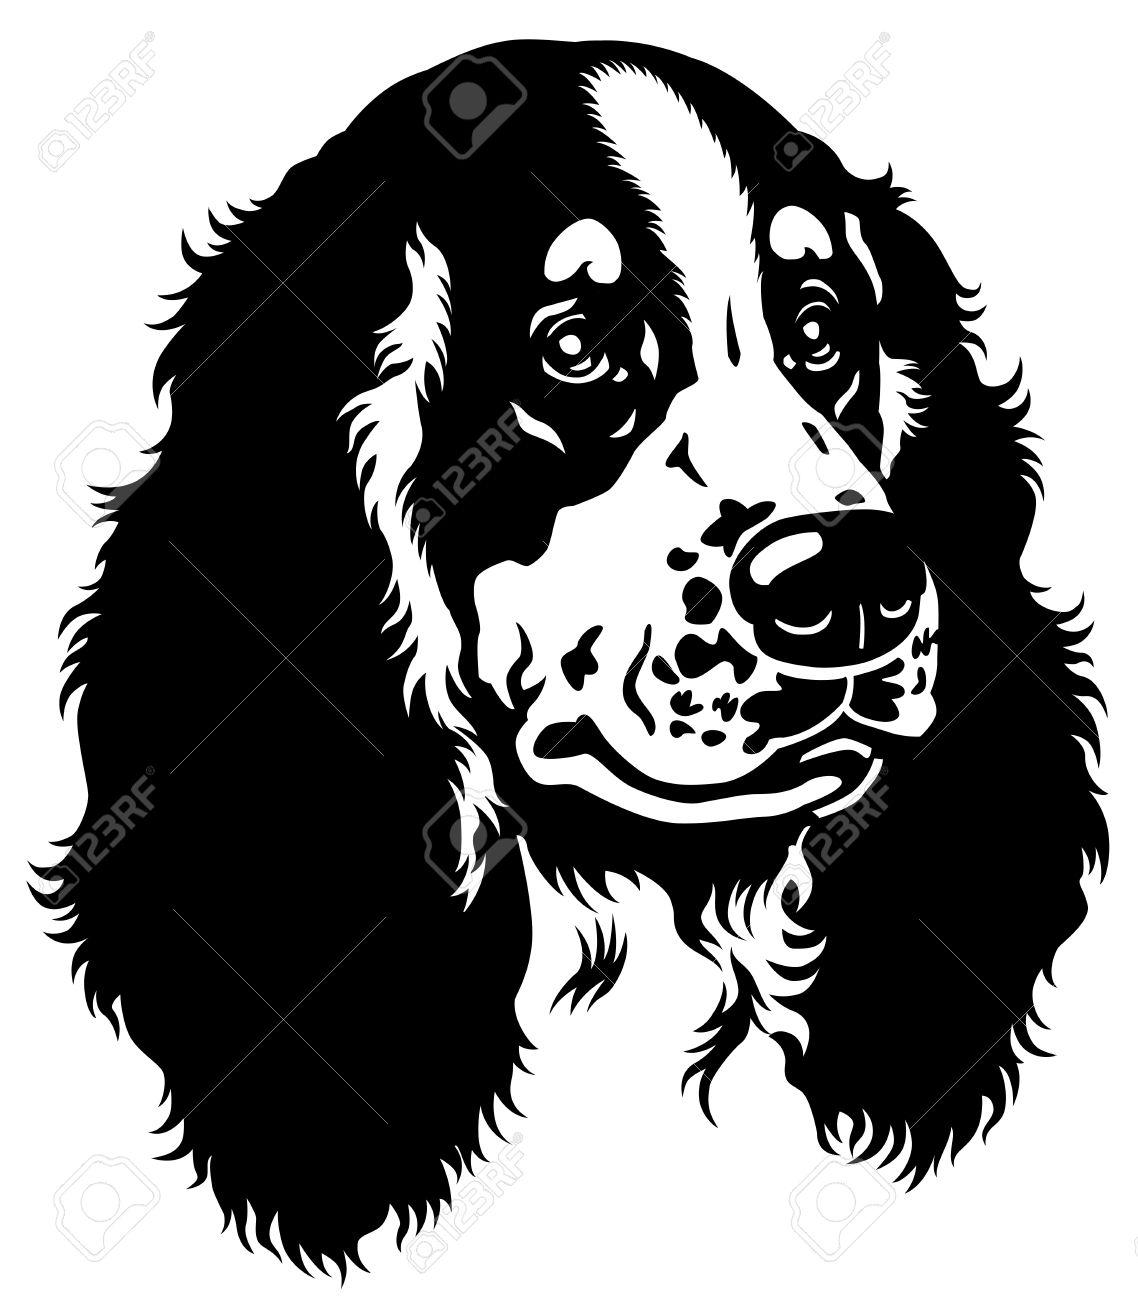 Cocker Spaniel: Dog Head, English Cocker Spaniel Breed, Black And White  Image